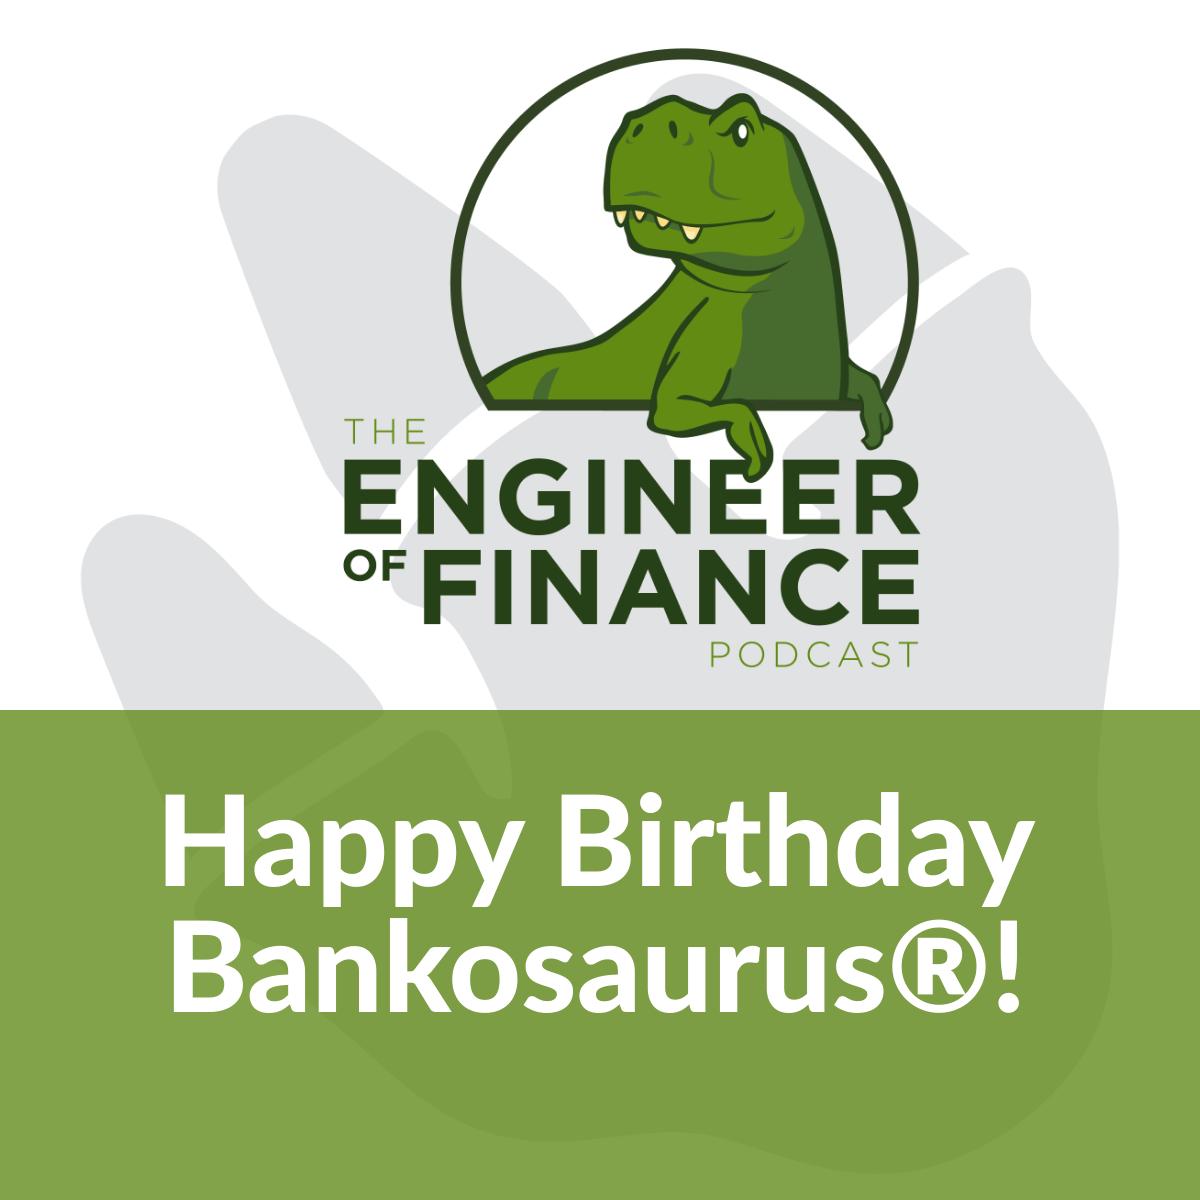 Happy Birthday Bankosaurus®! – Episode 148